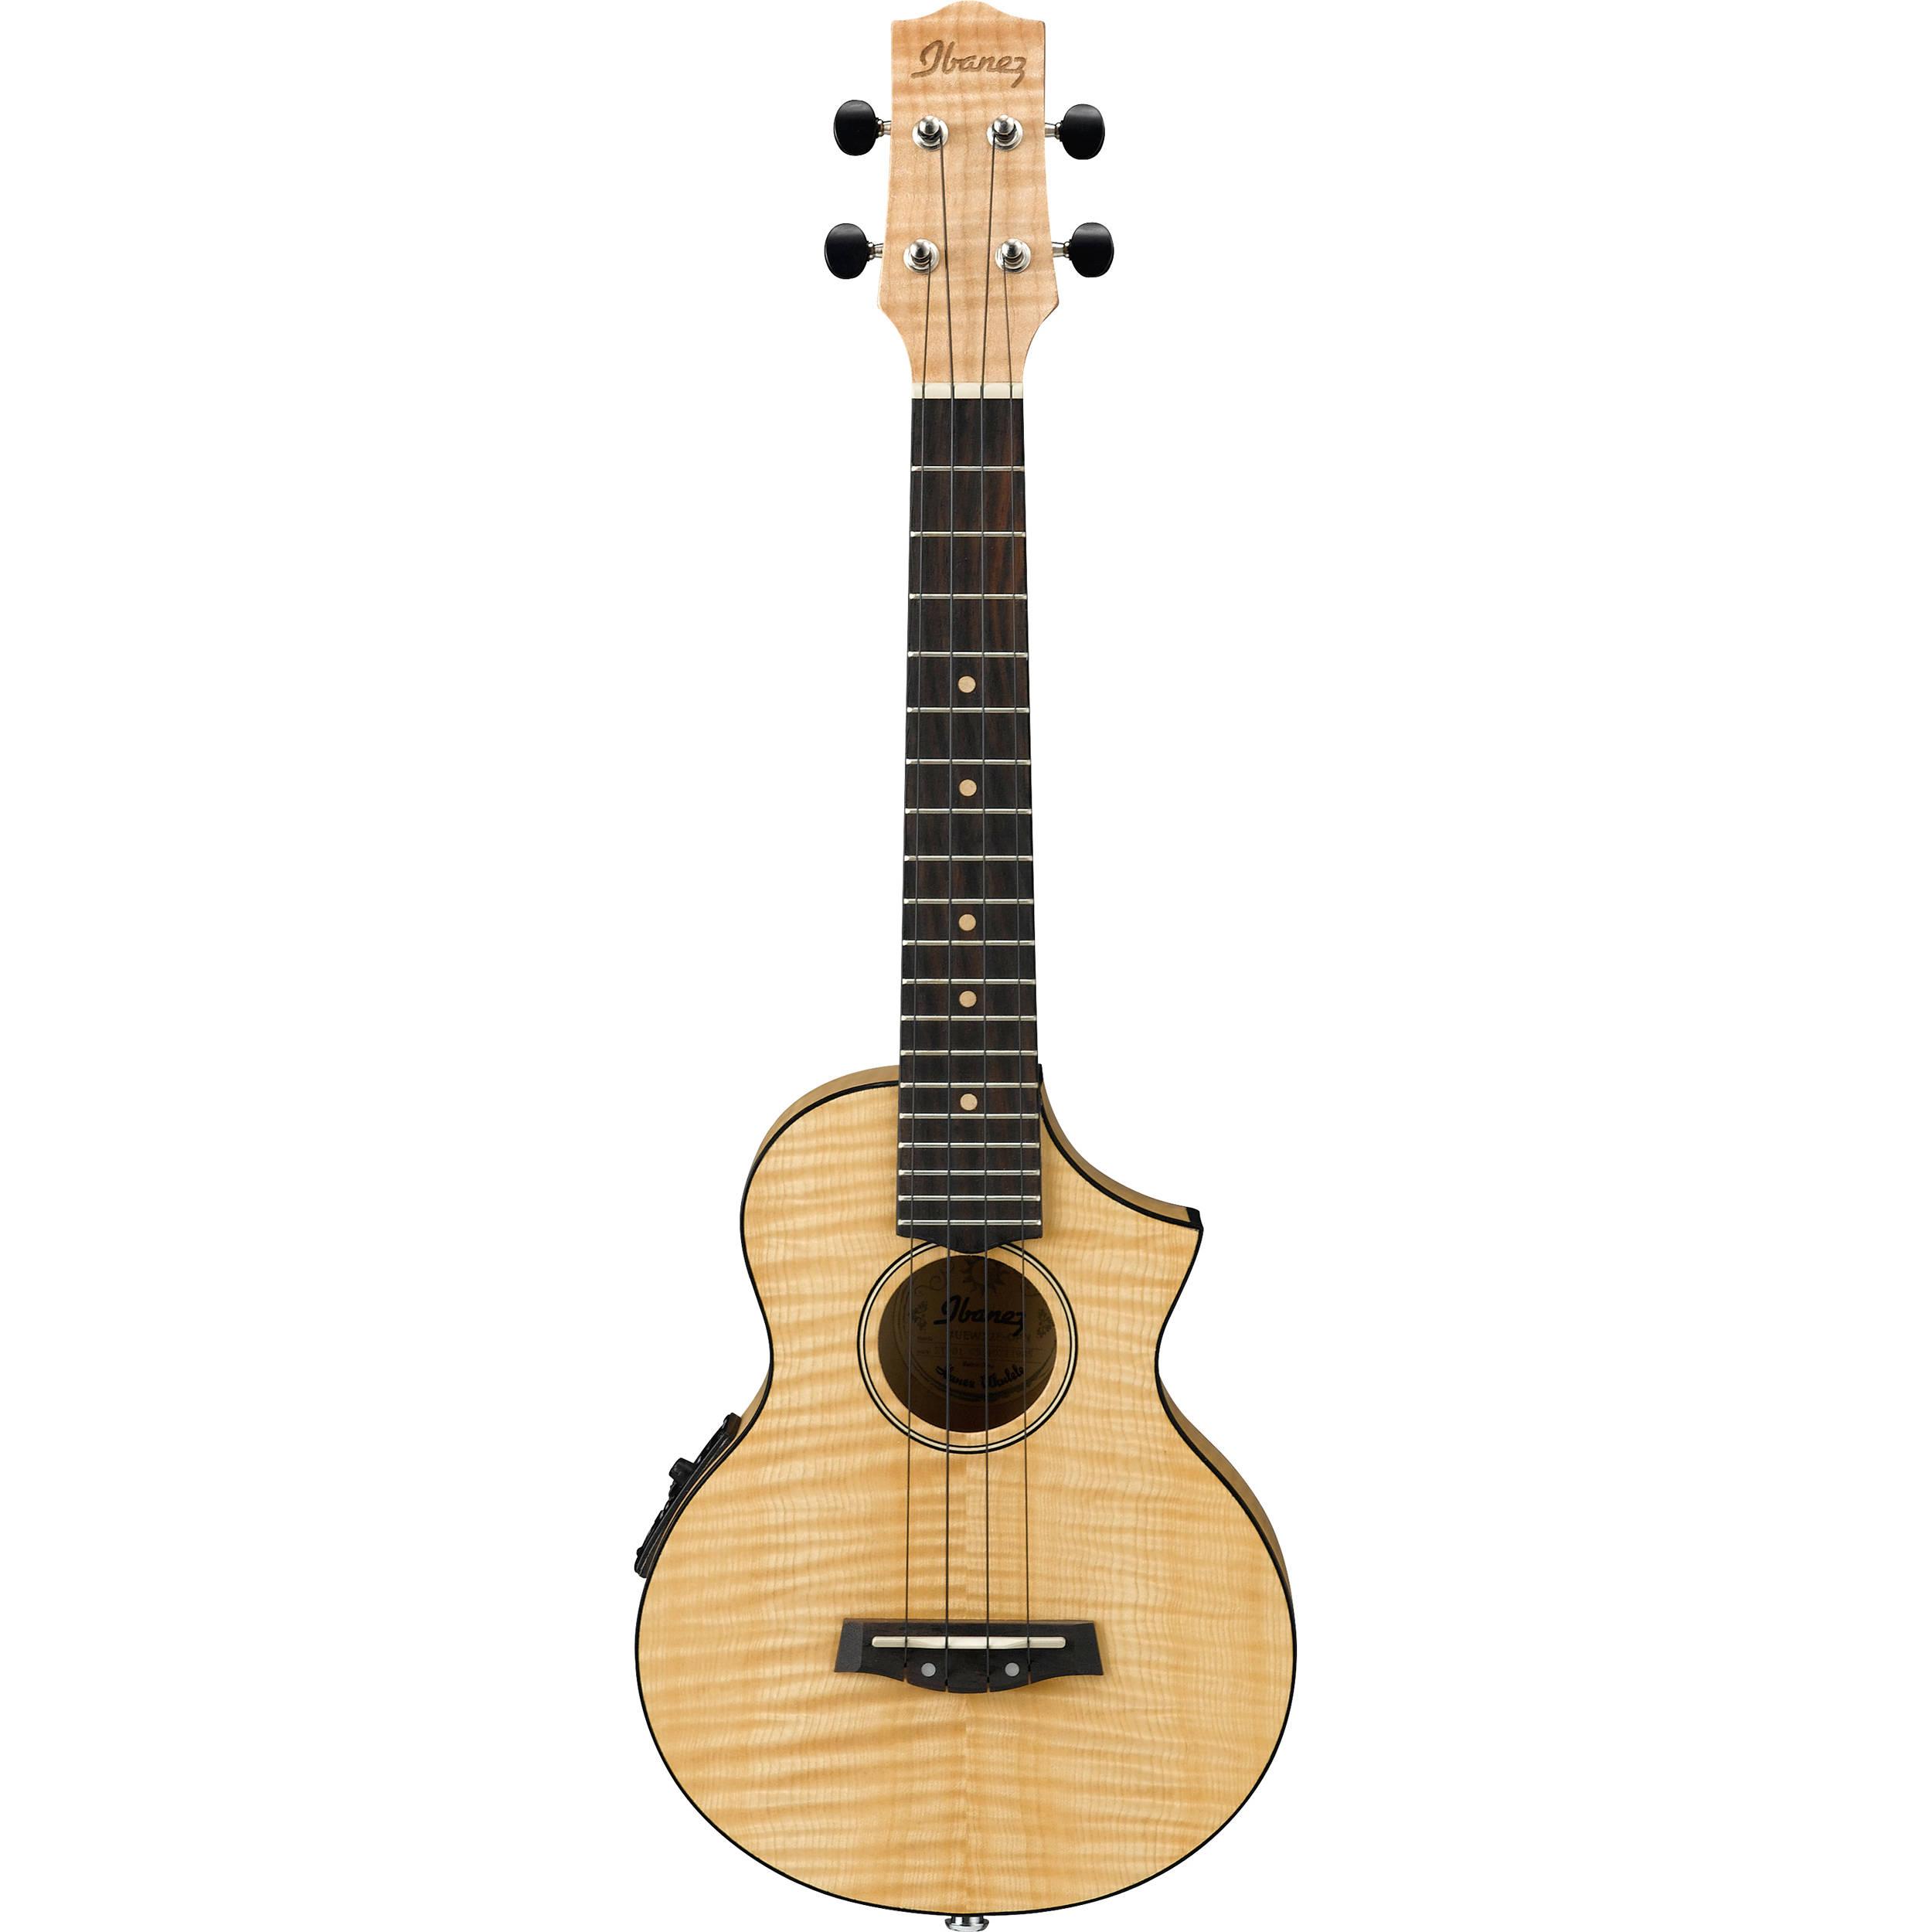 ibanez uew12e acoustic electric concert ukulele uew12e b h photo. Black Bedroom Furniture Sets. Home Design Ideas